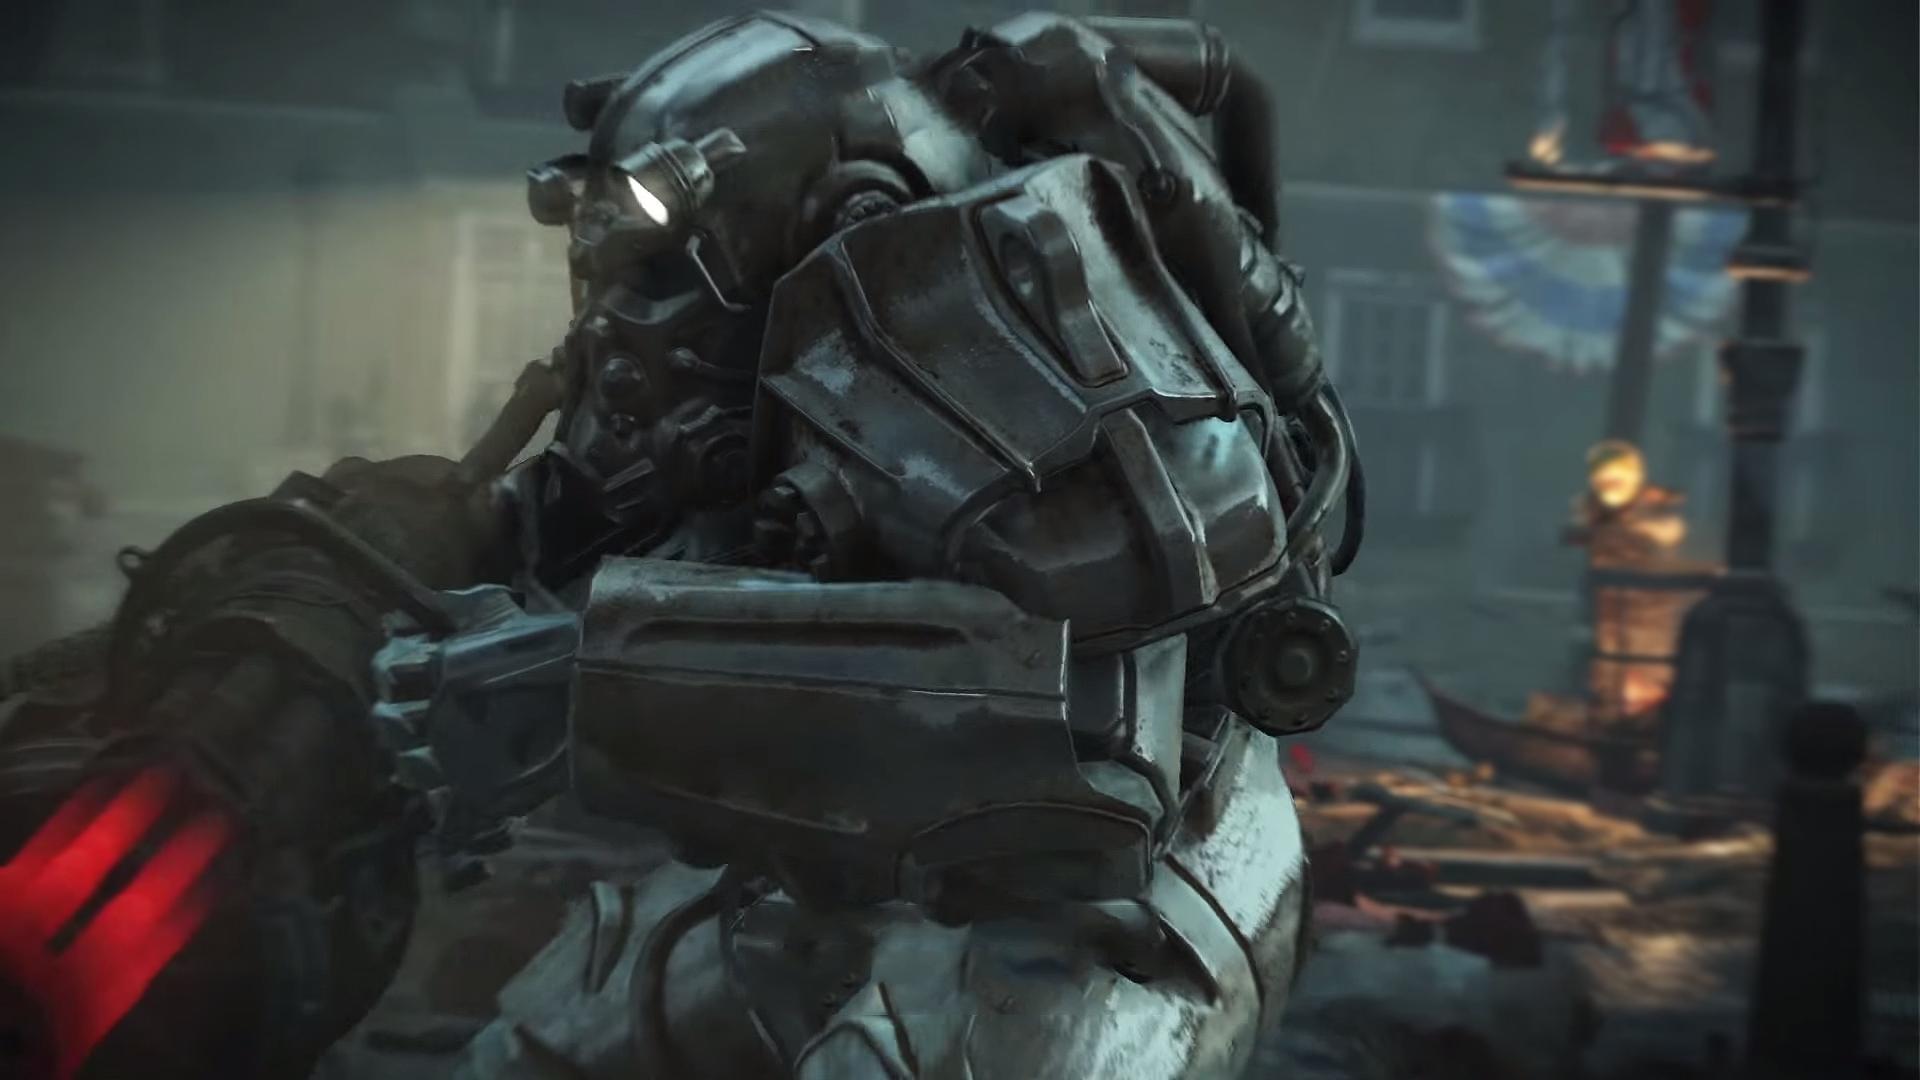 Fallout 4 – Brotherhood of Steel Armor Wallpaper [1920×1080] …